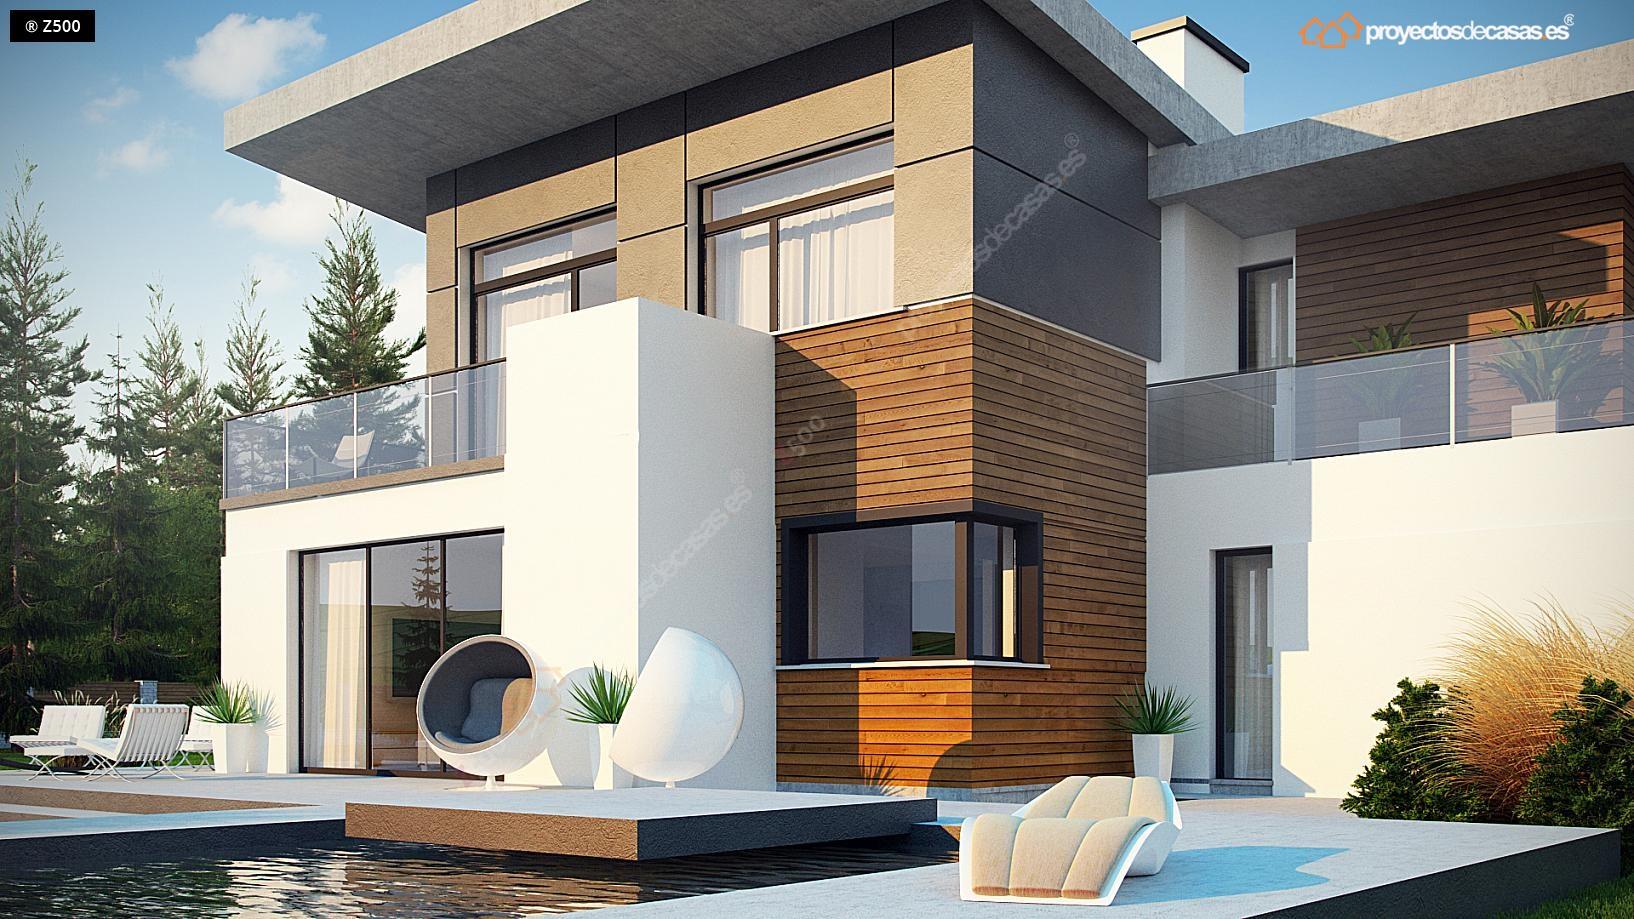 Proyectos de casas casa de lujo con piscina for Casas rurales en badajoz con piscina